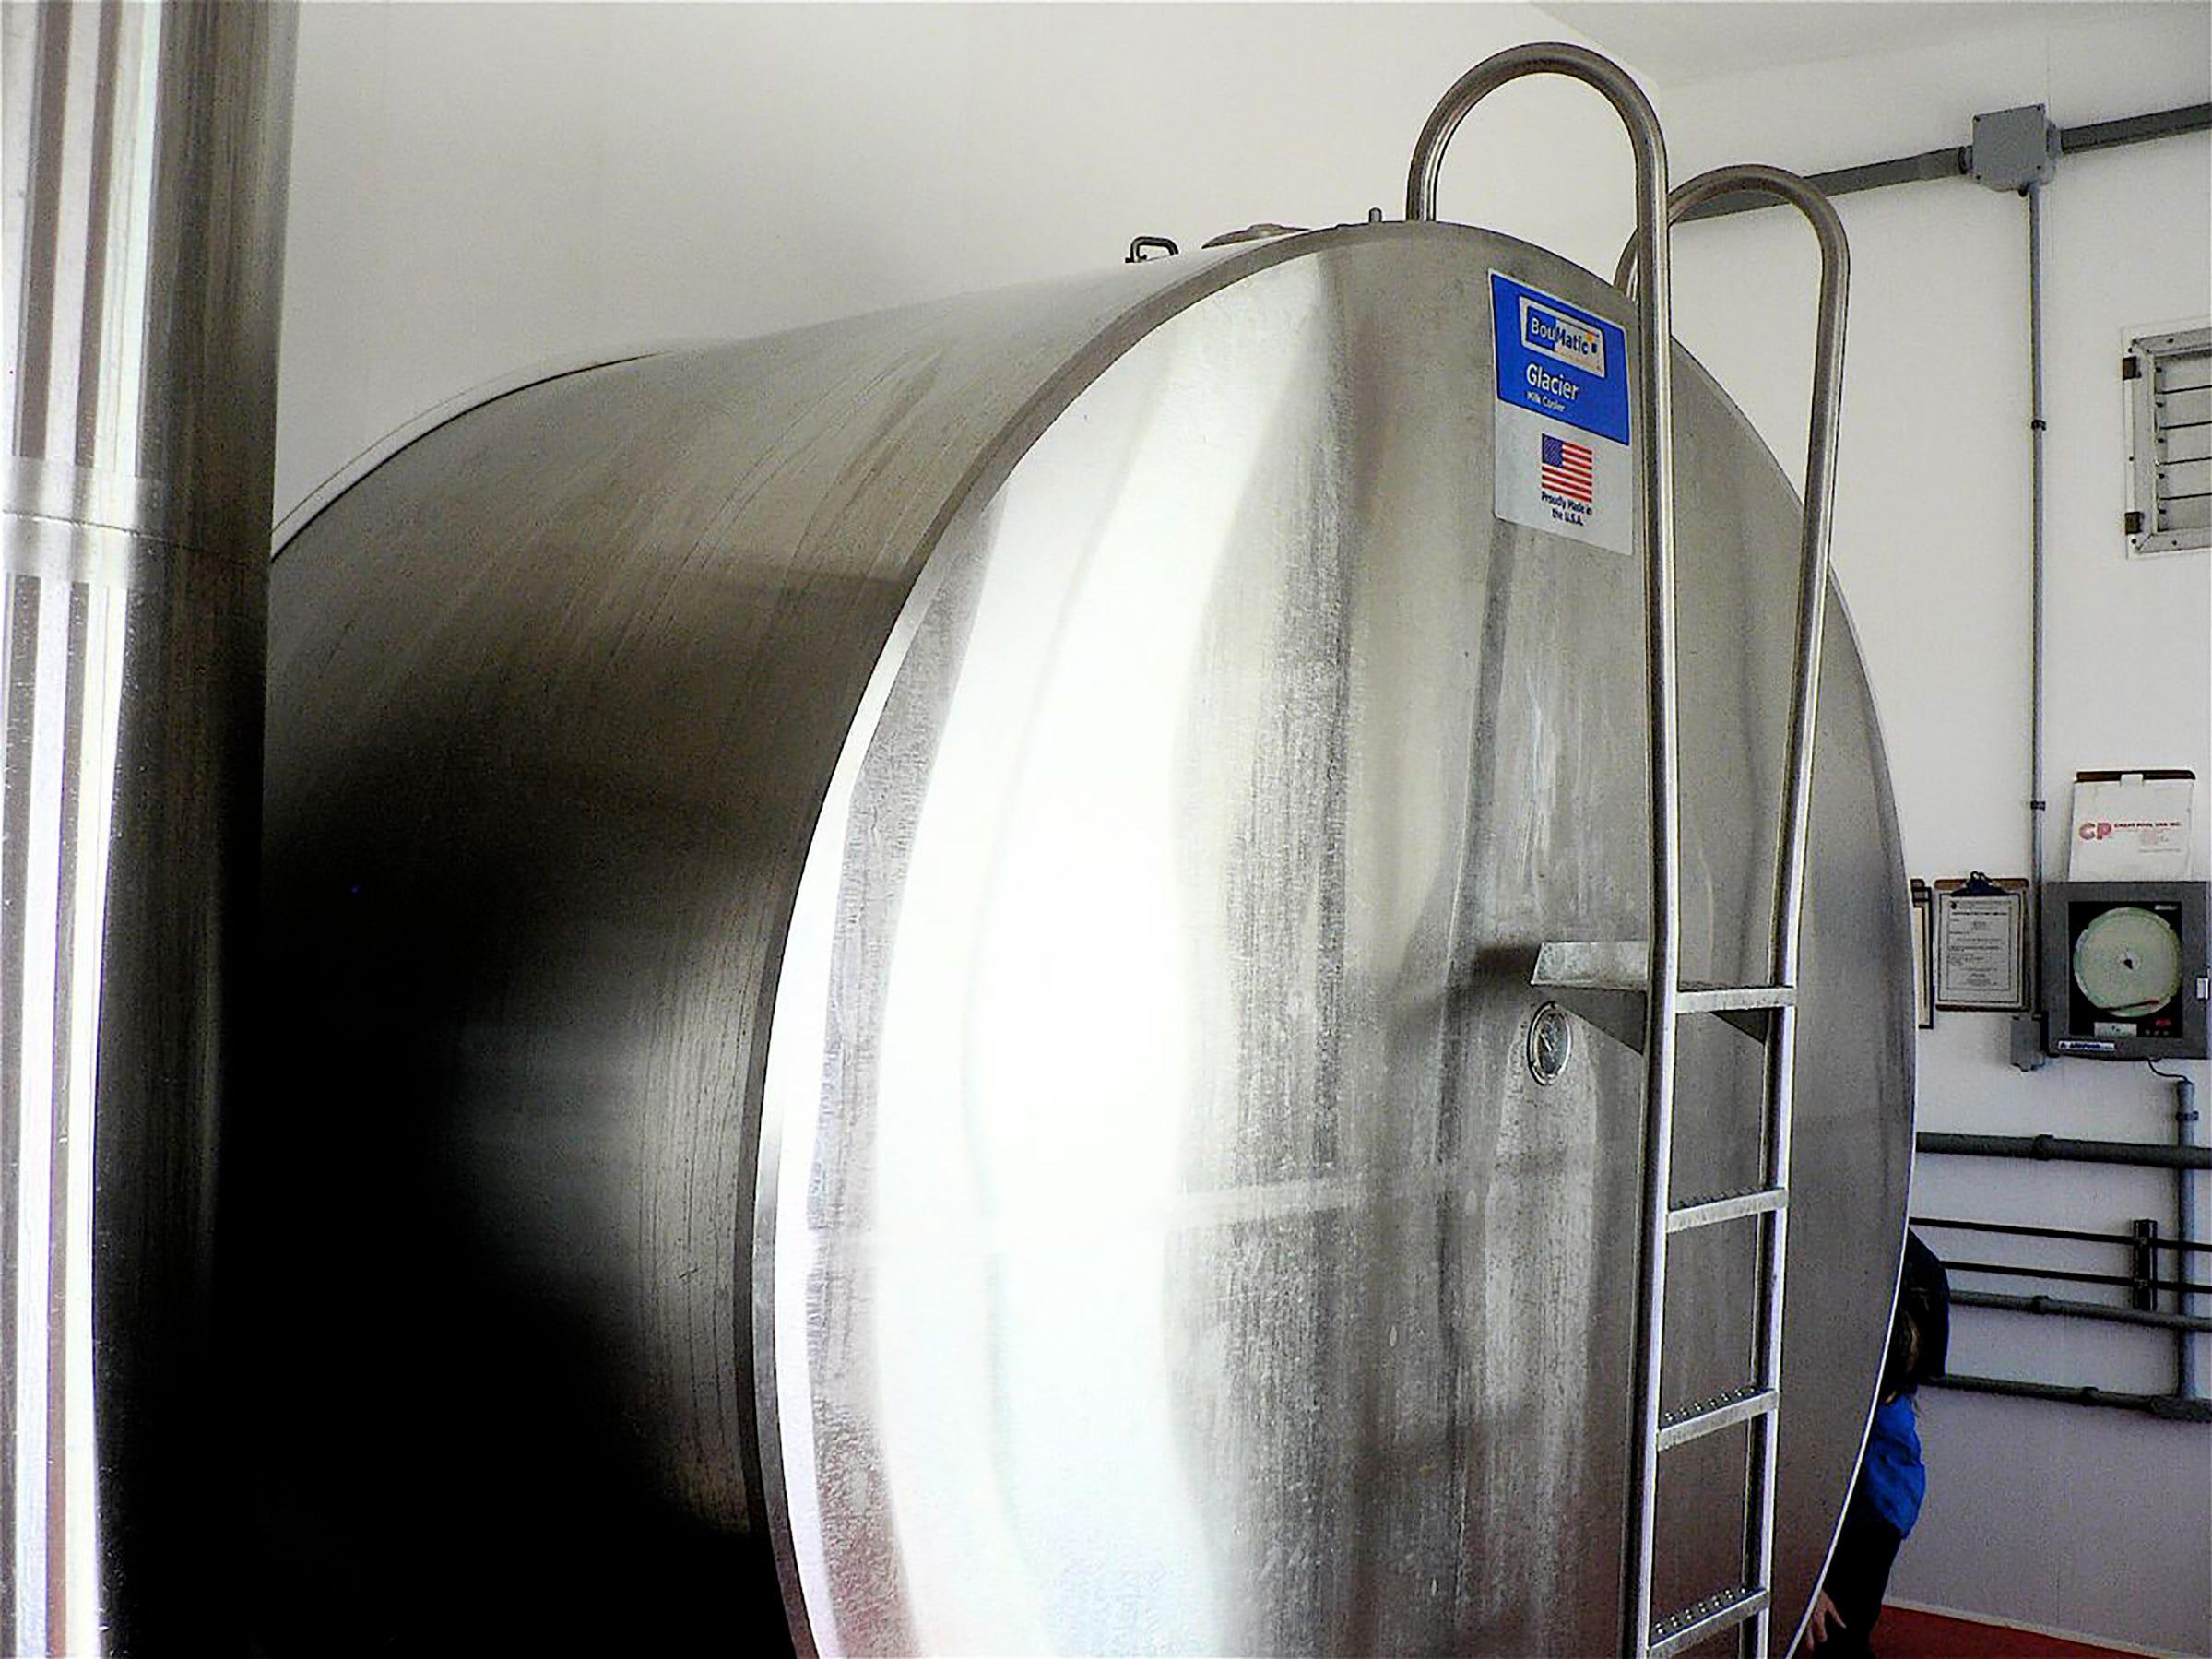 The new 7,000 gallon bulk tank.